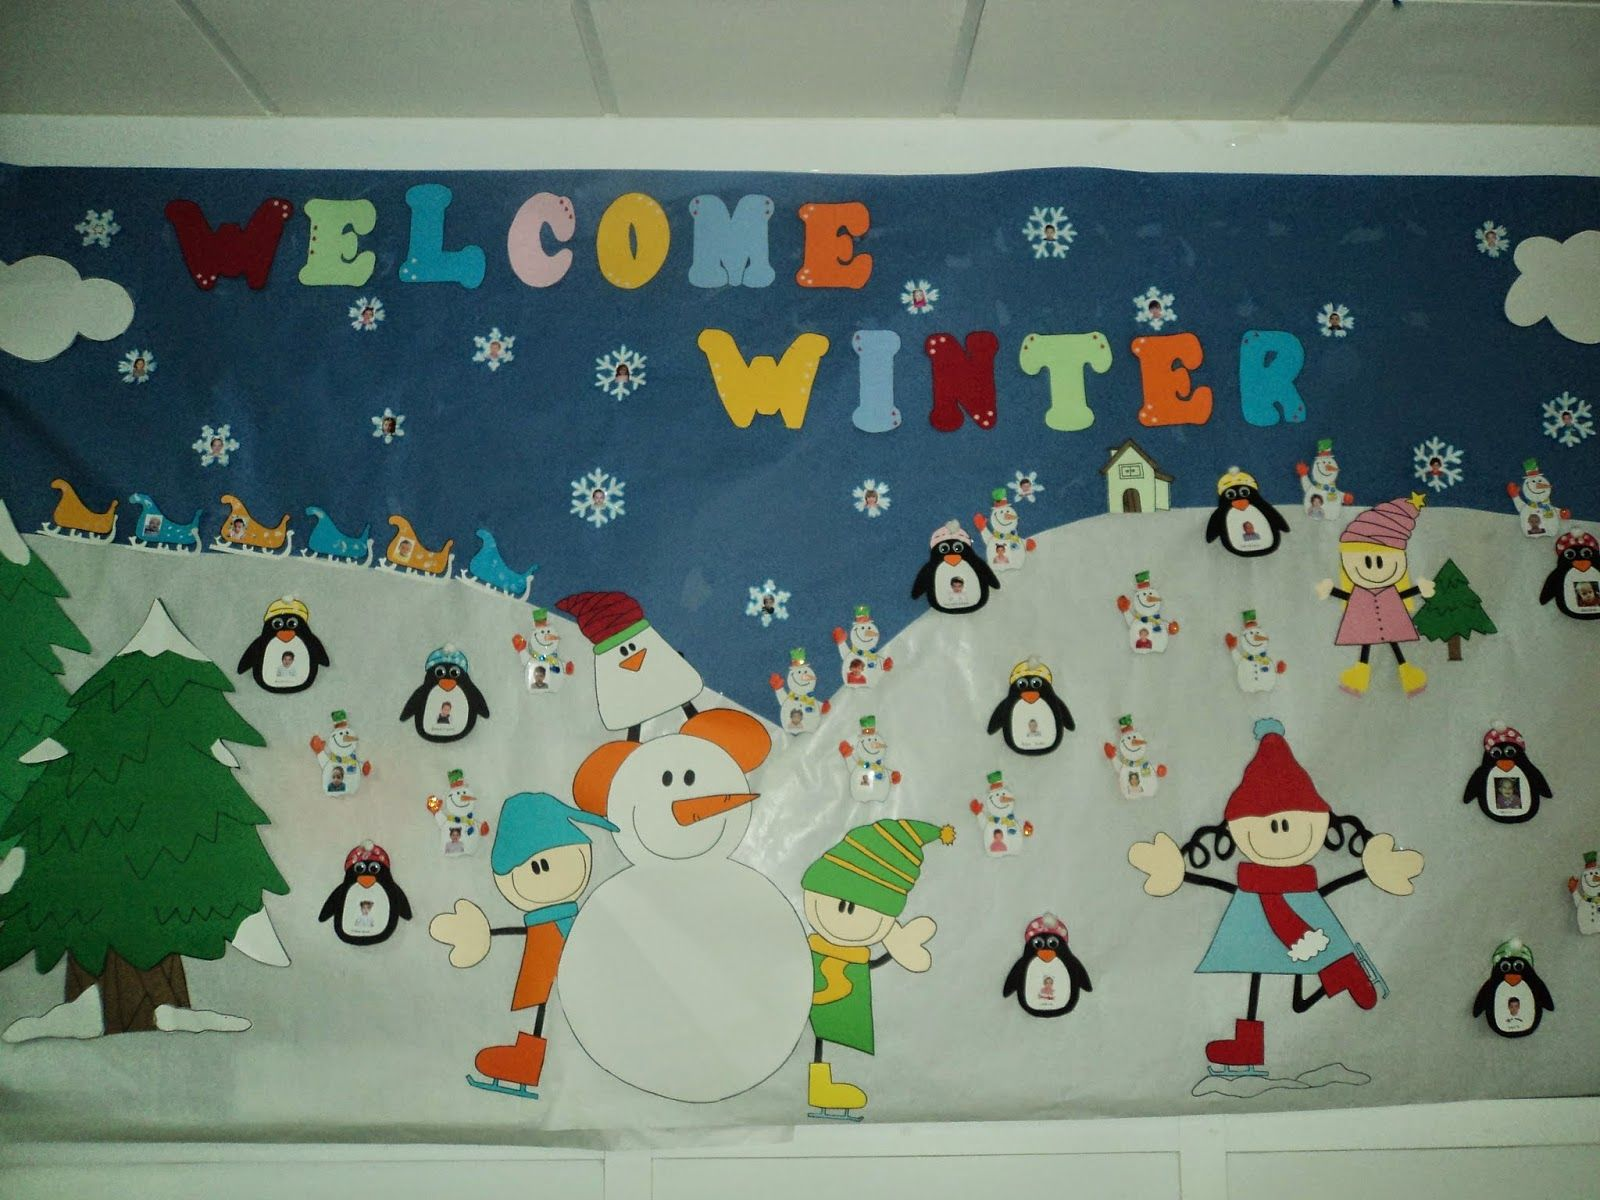 Centro de educaci n infantil almeragua mural de for Actividades para el salon de clases